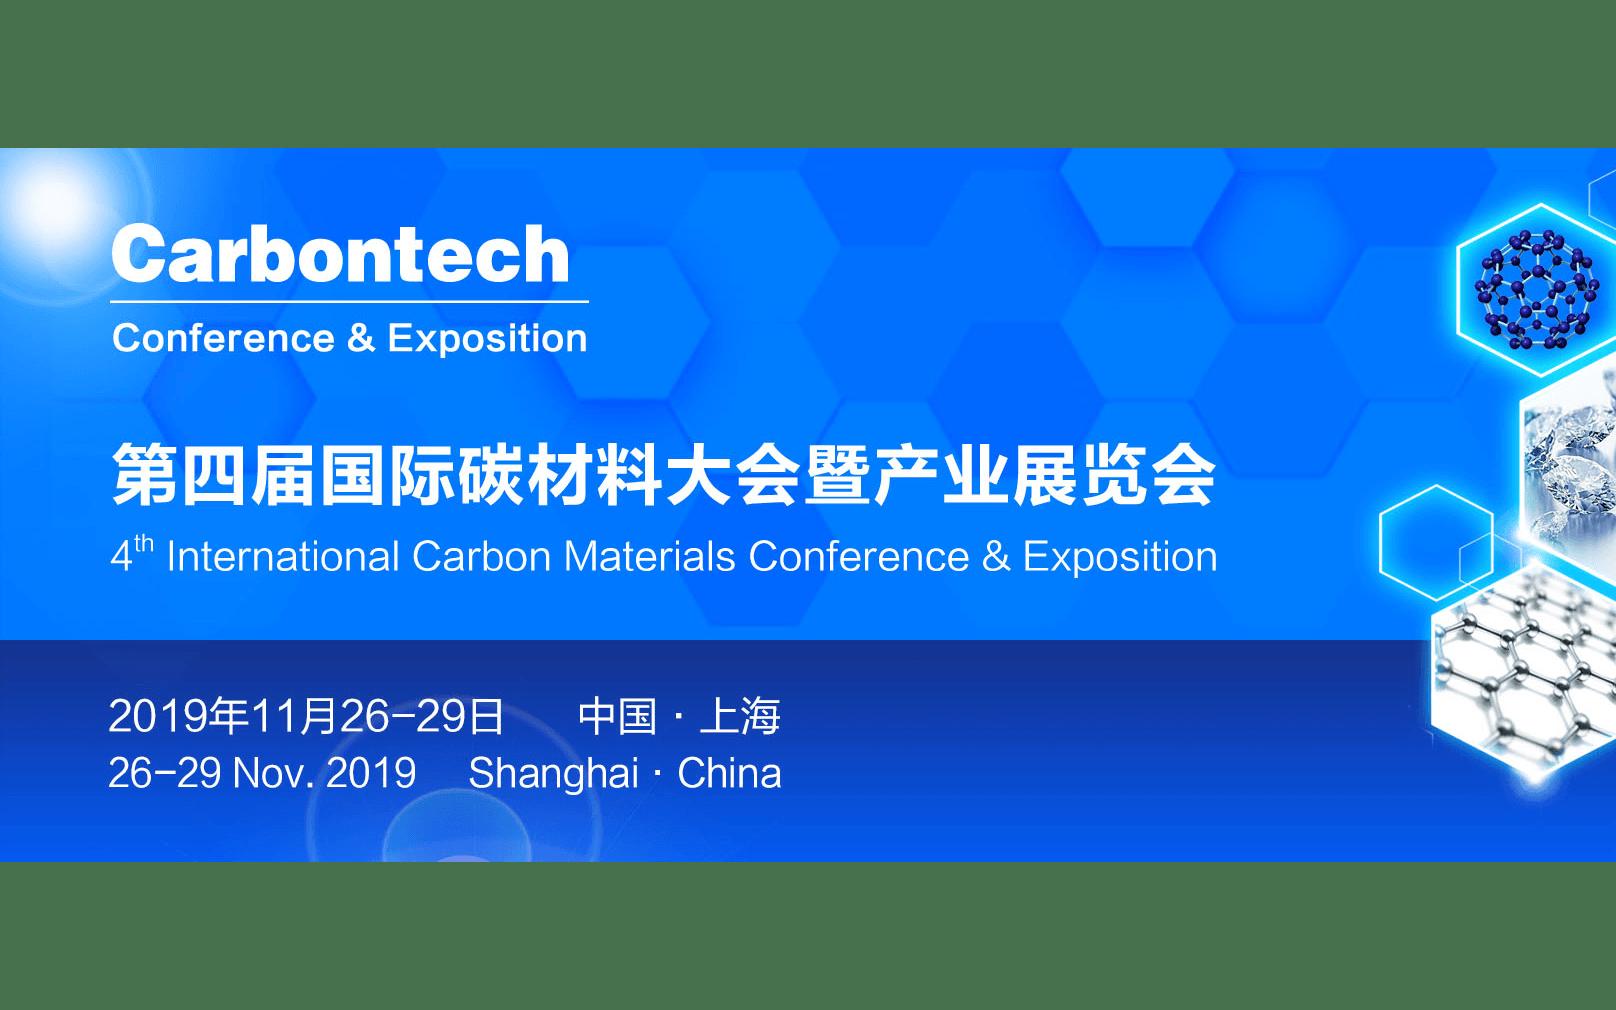 Carbontech 2019(上海)电化学储能材料与器件论坛——高能量密度负极、新型电池、超级电容器